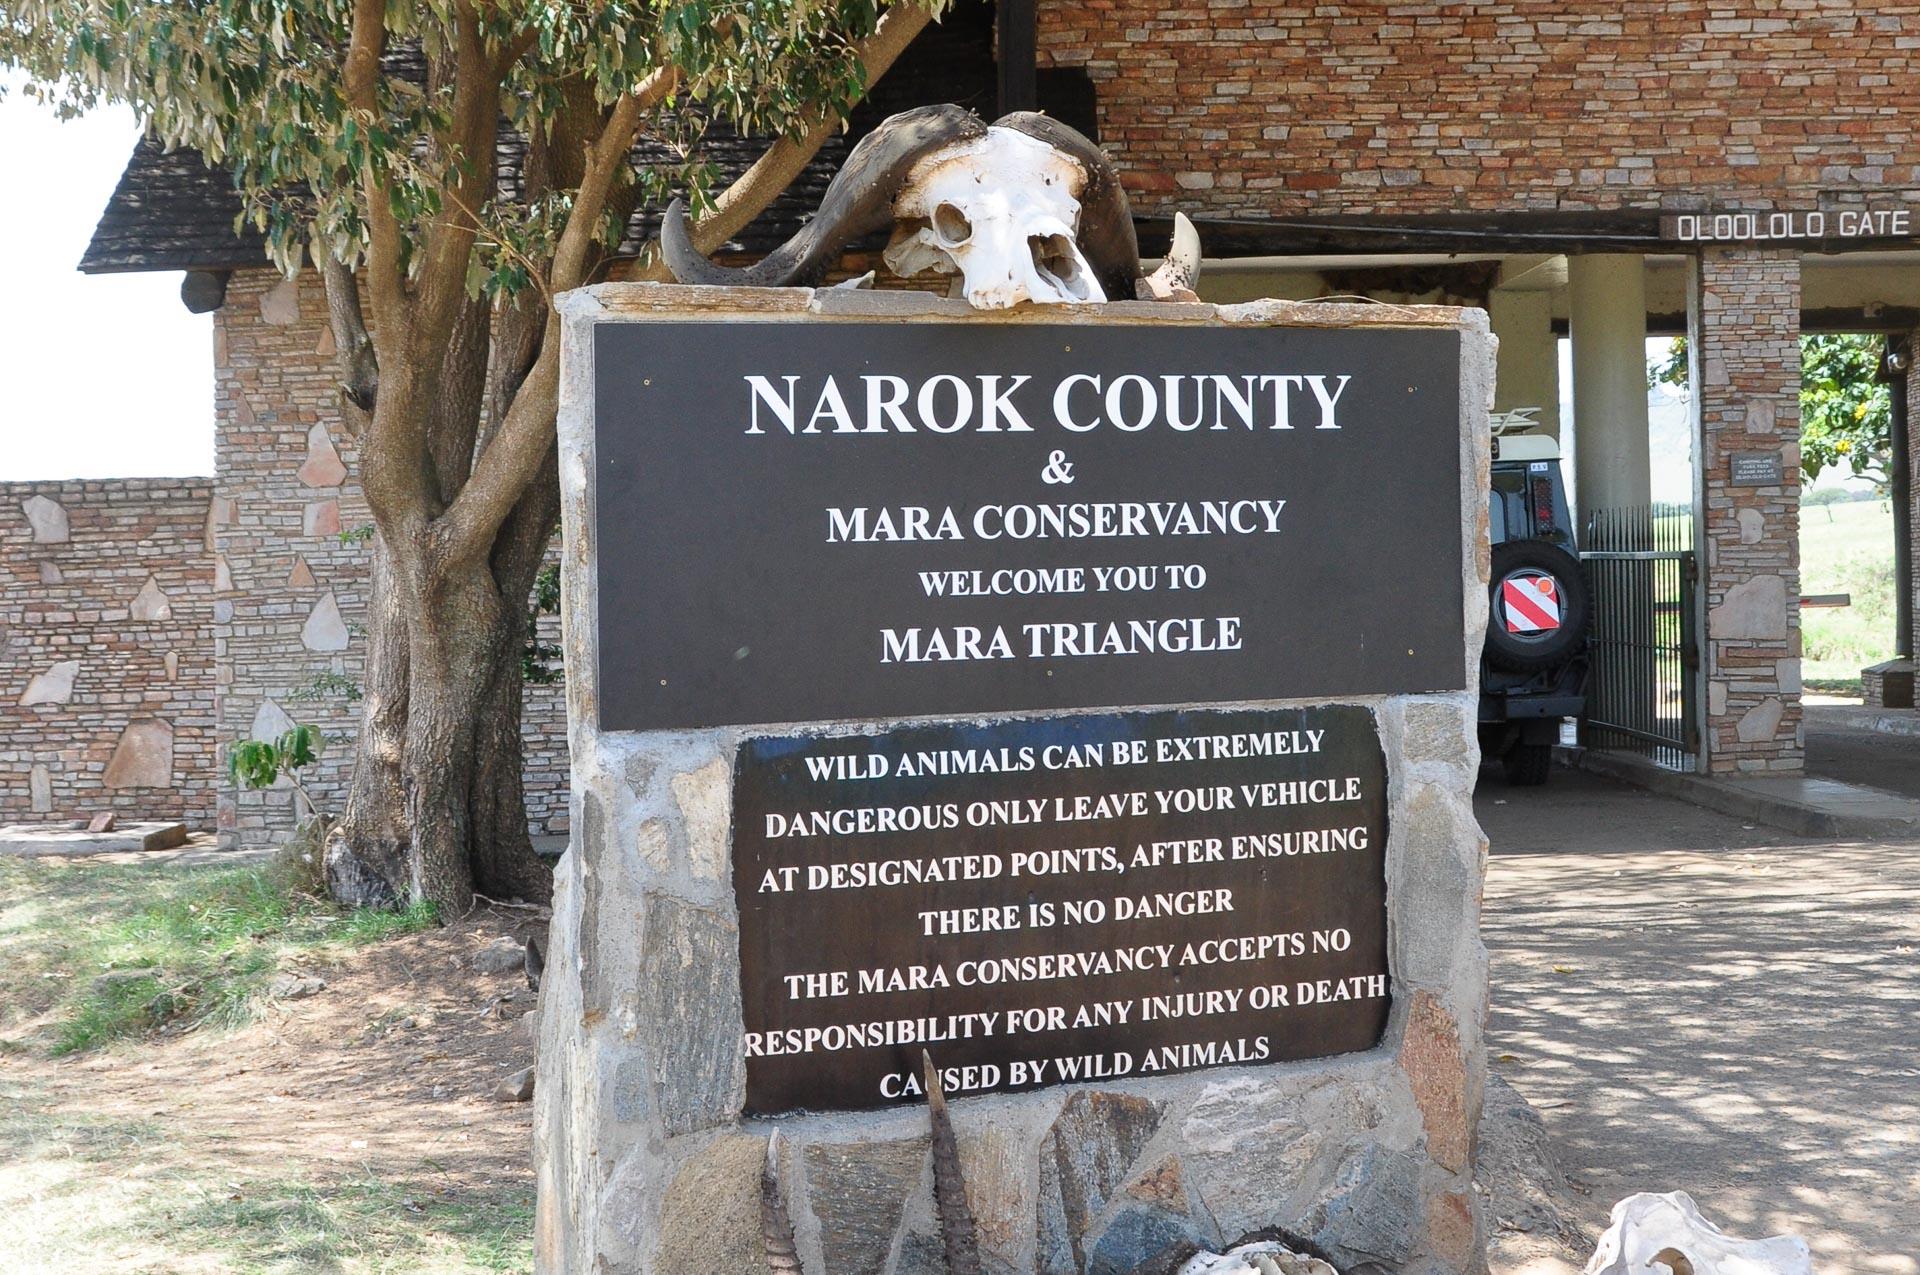 Masai-Mara-Kenia-Globetrotter-Select-20